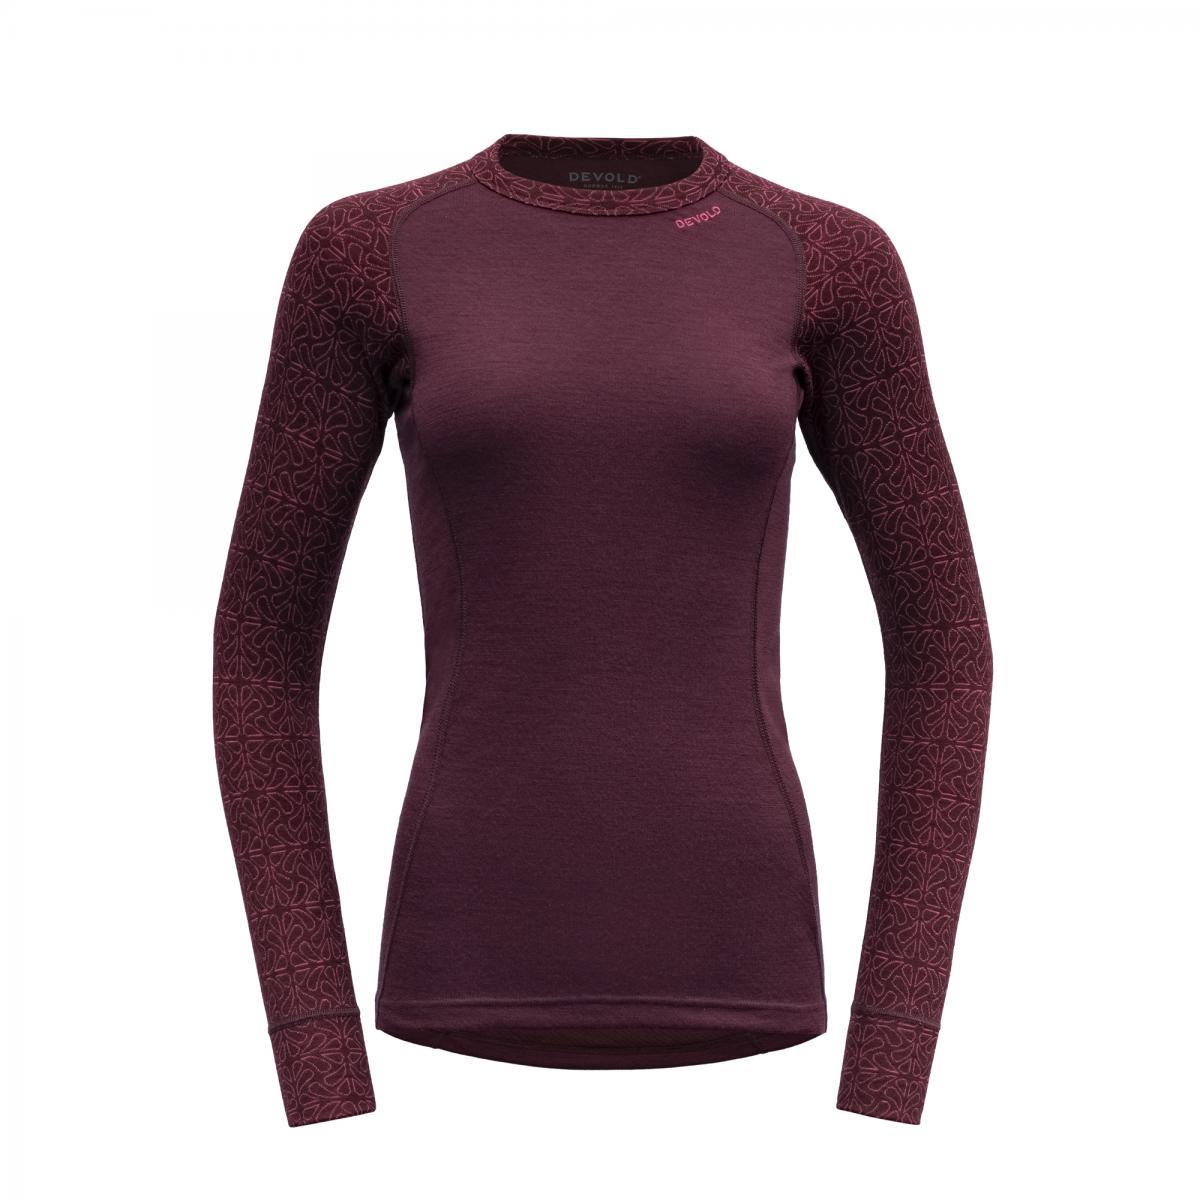 Devold  Duo Active Woman Shirt